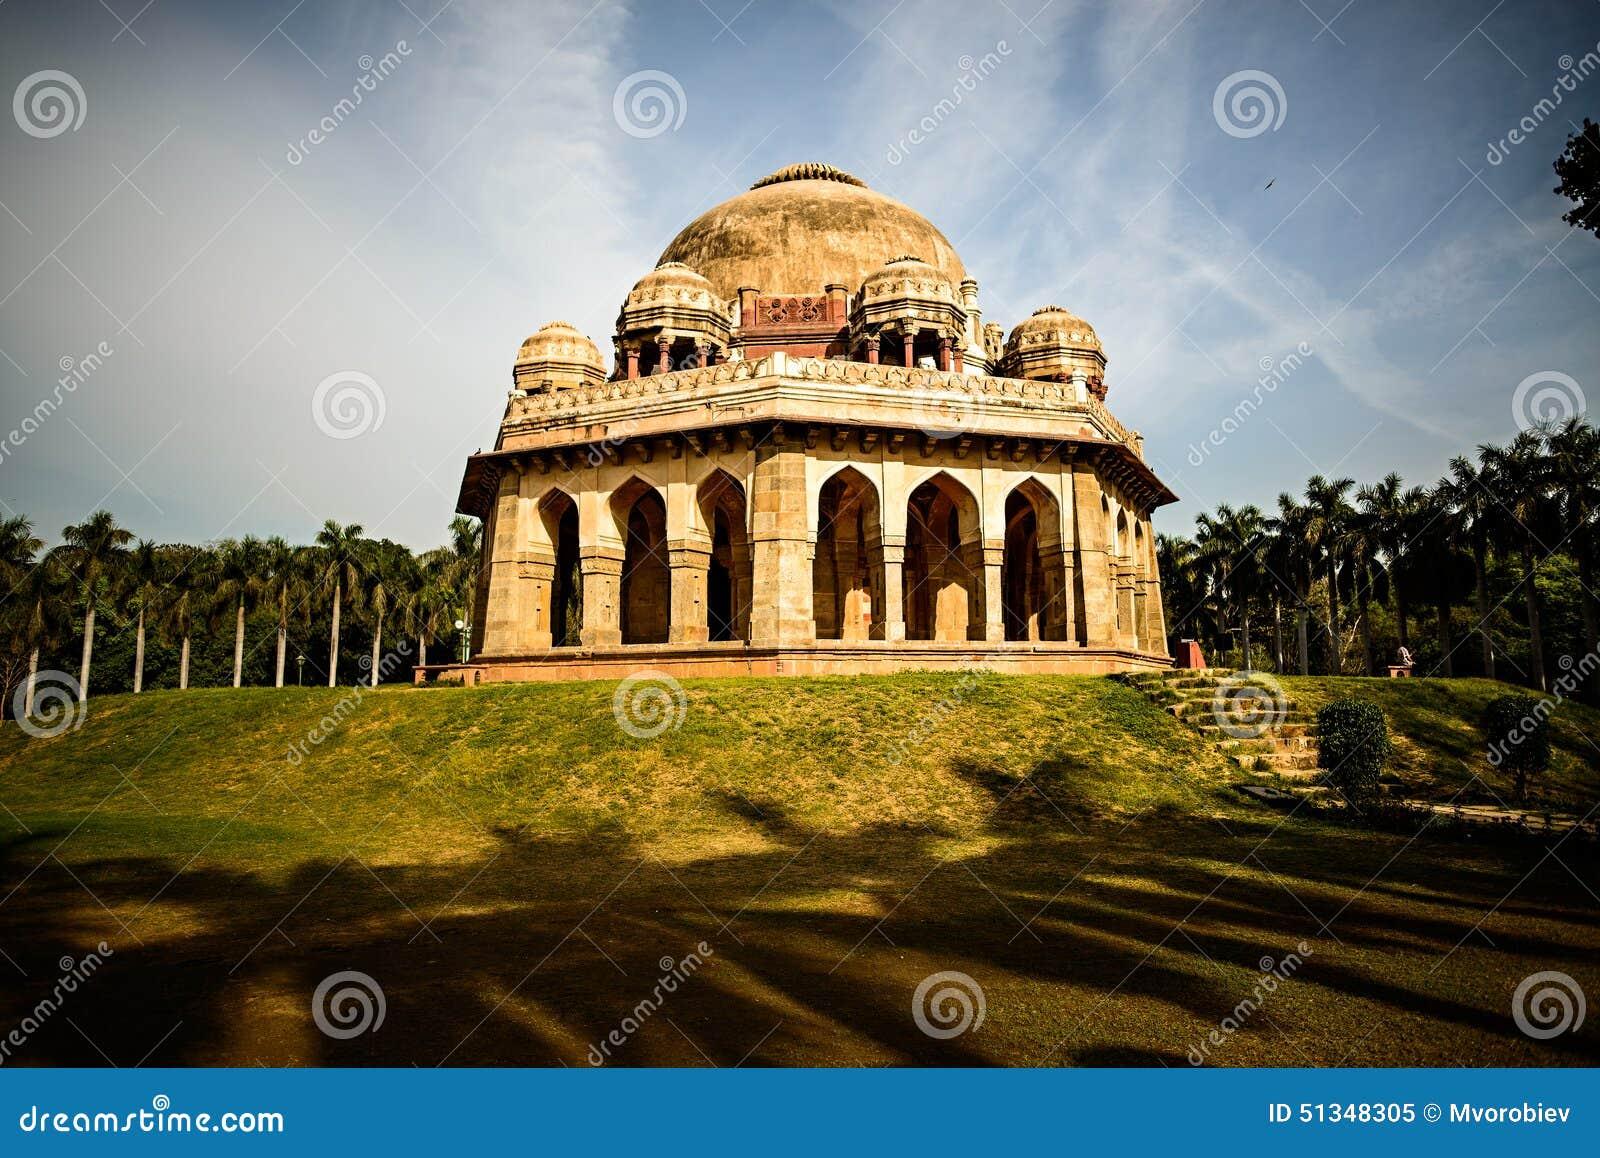 La tumba de Mohammed Shah en los jardines de Lodi